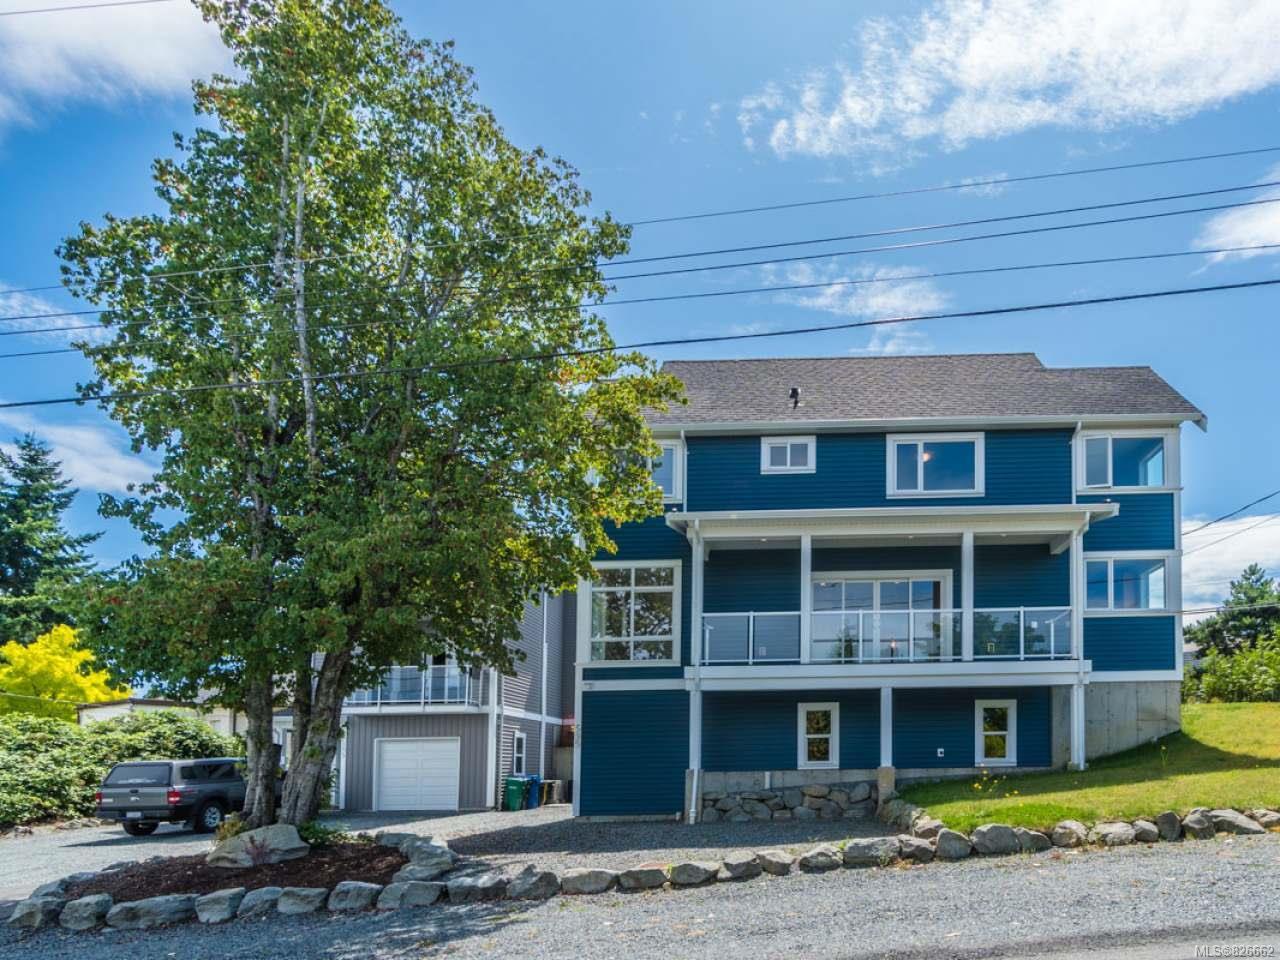 Main Photo: 595 Larch St in NANAIMO: Na Brechin Hill House for sale (Nanaimo)  : MLS®# 826662